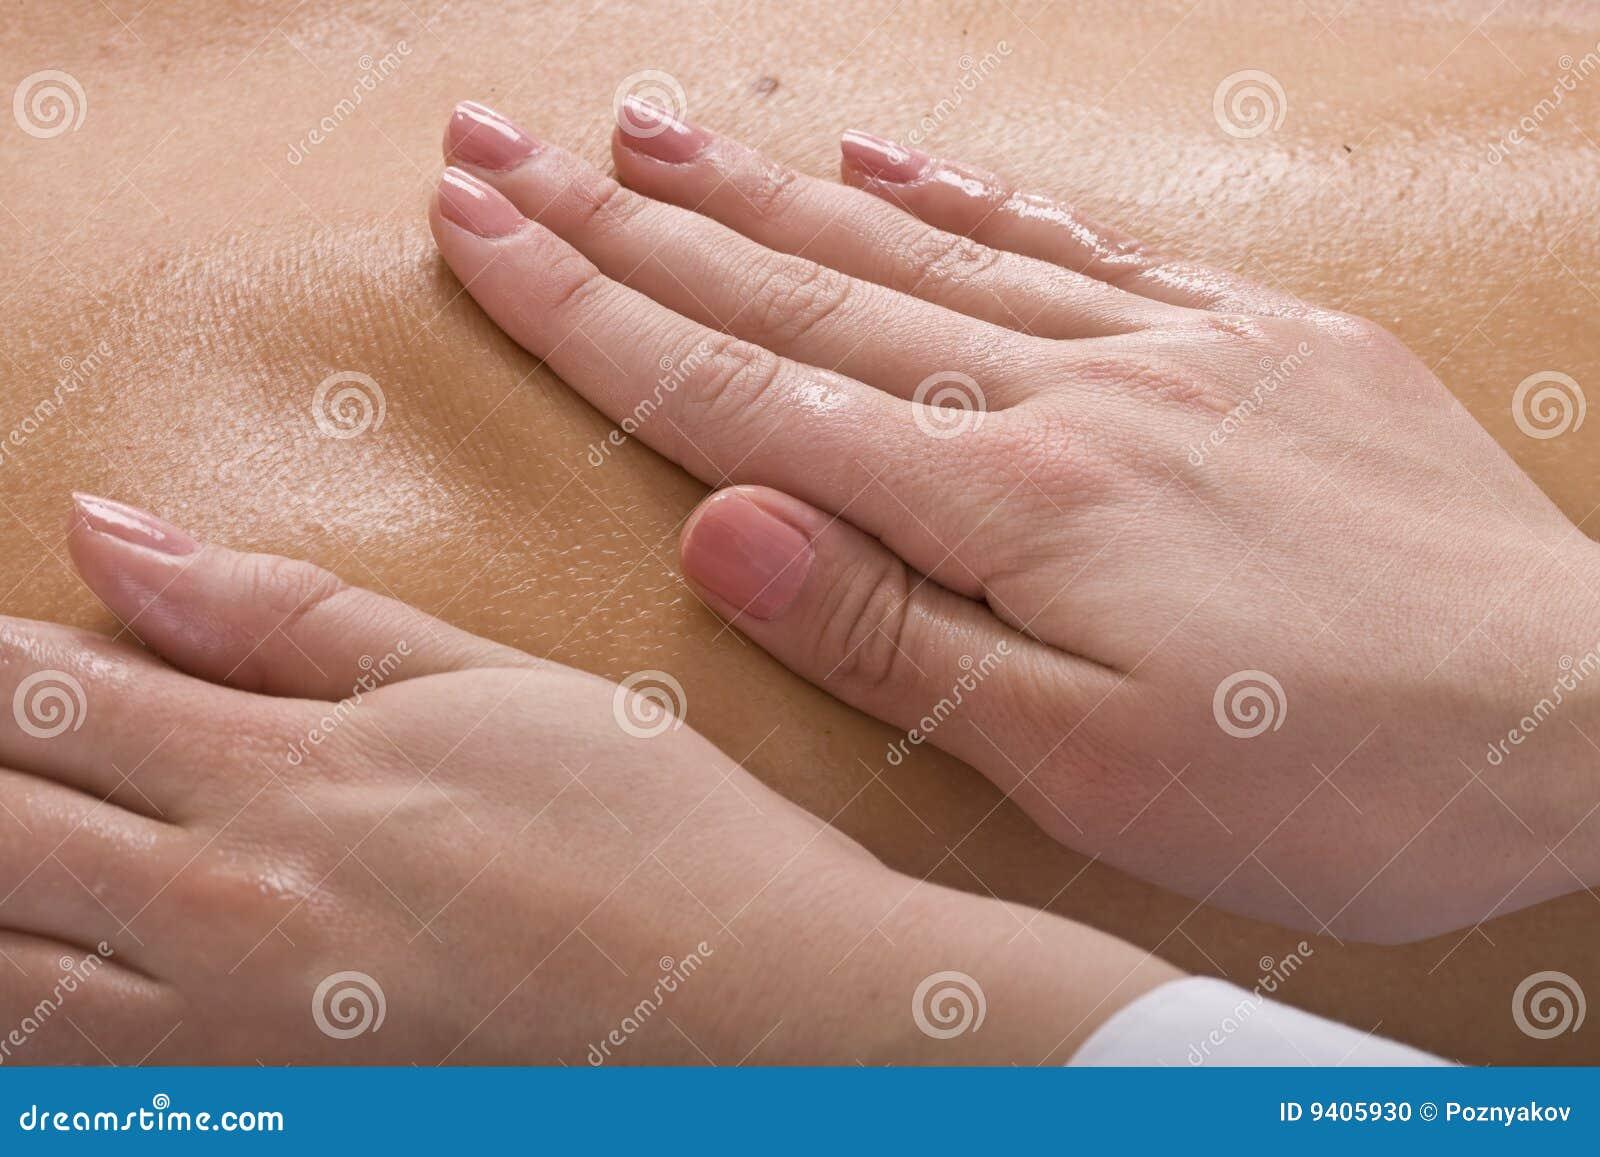 oily sexual massage sunshine brothel